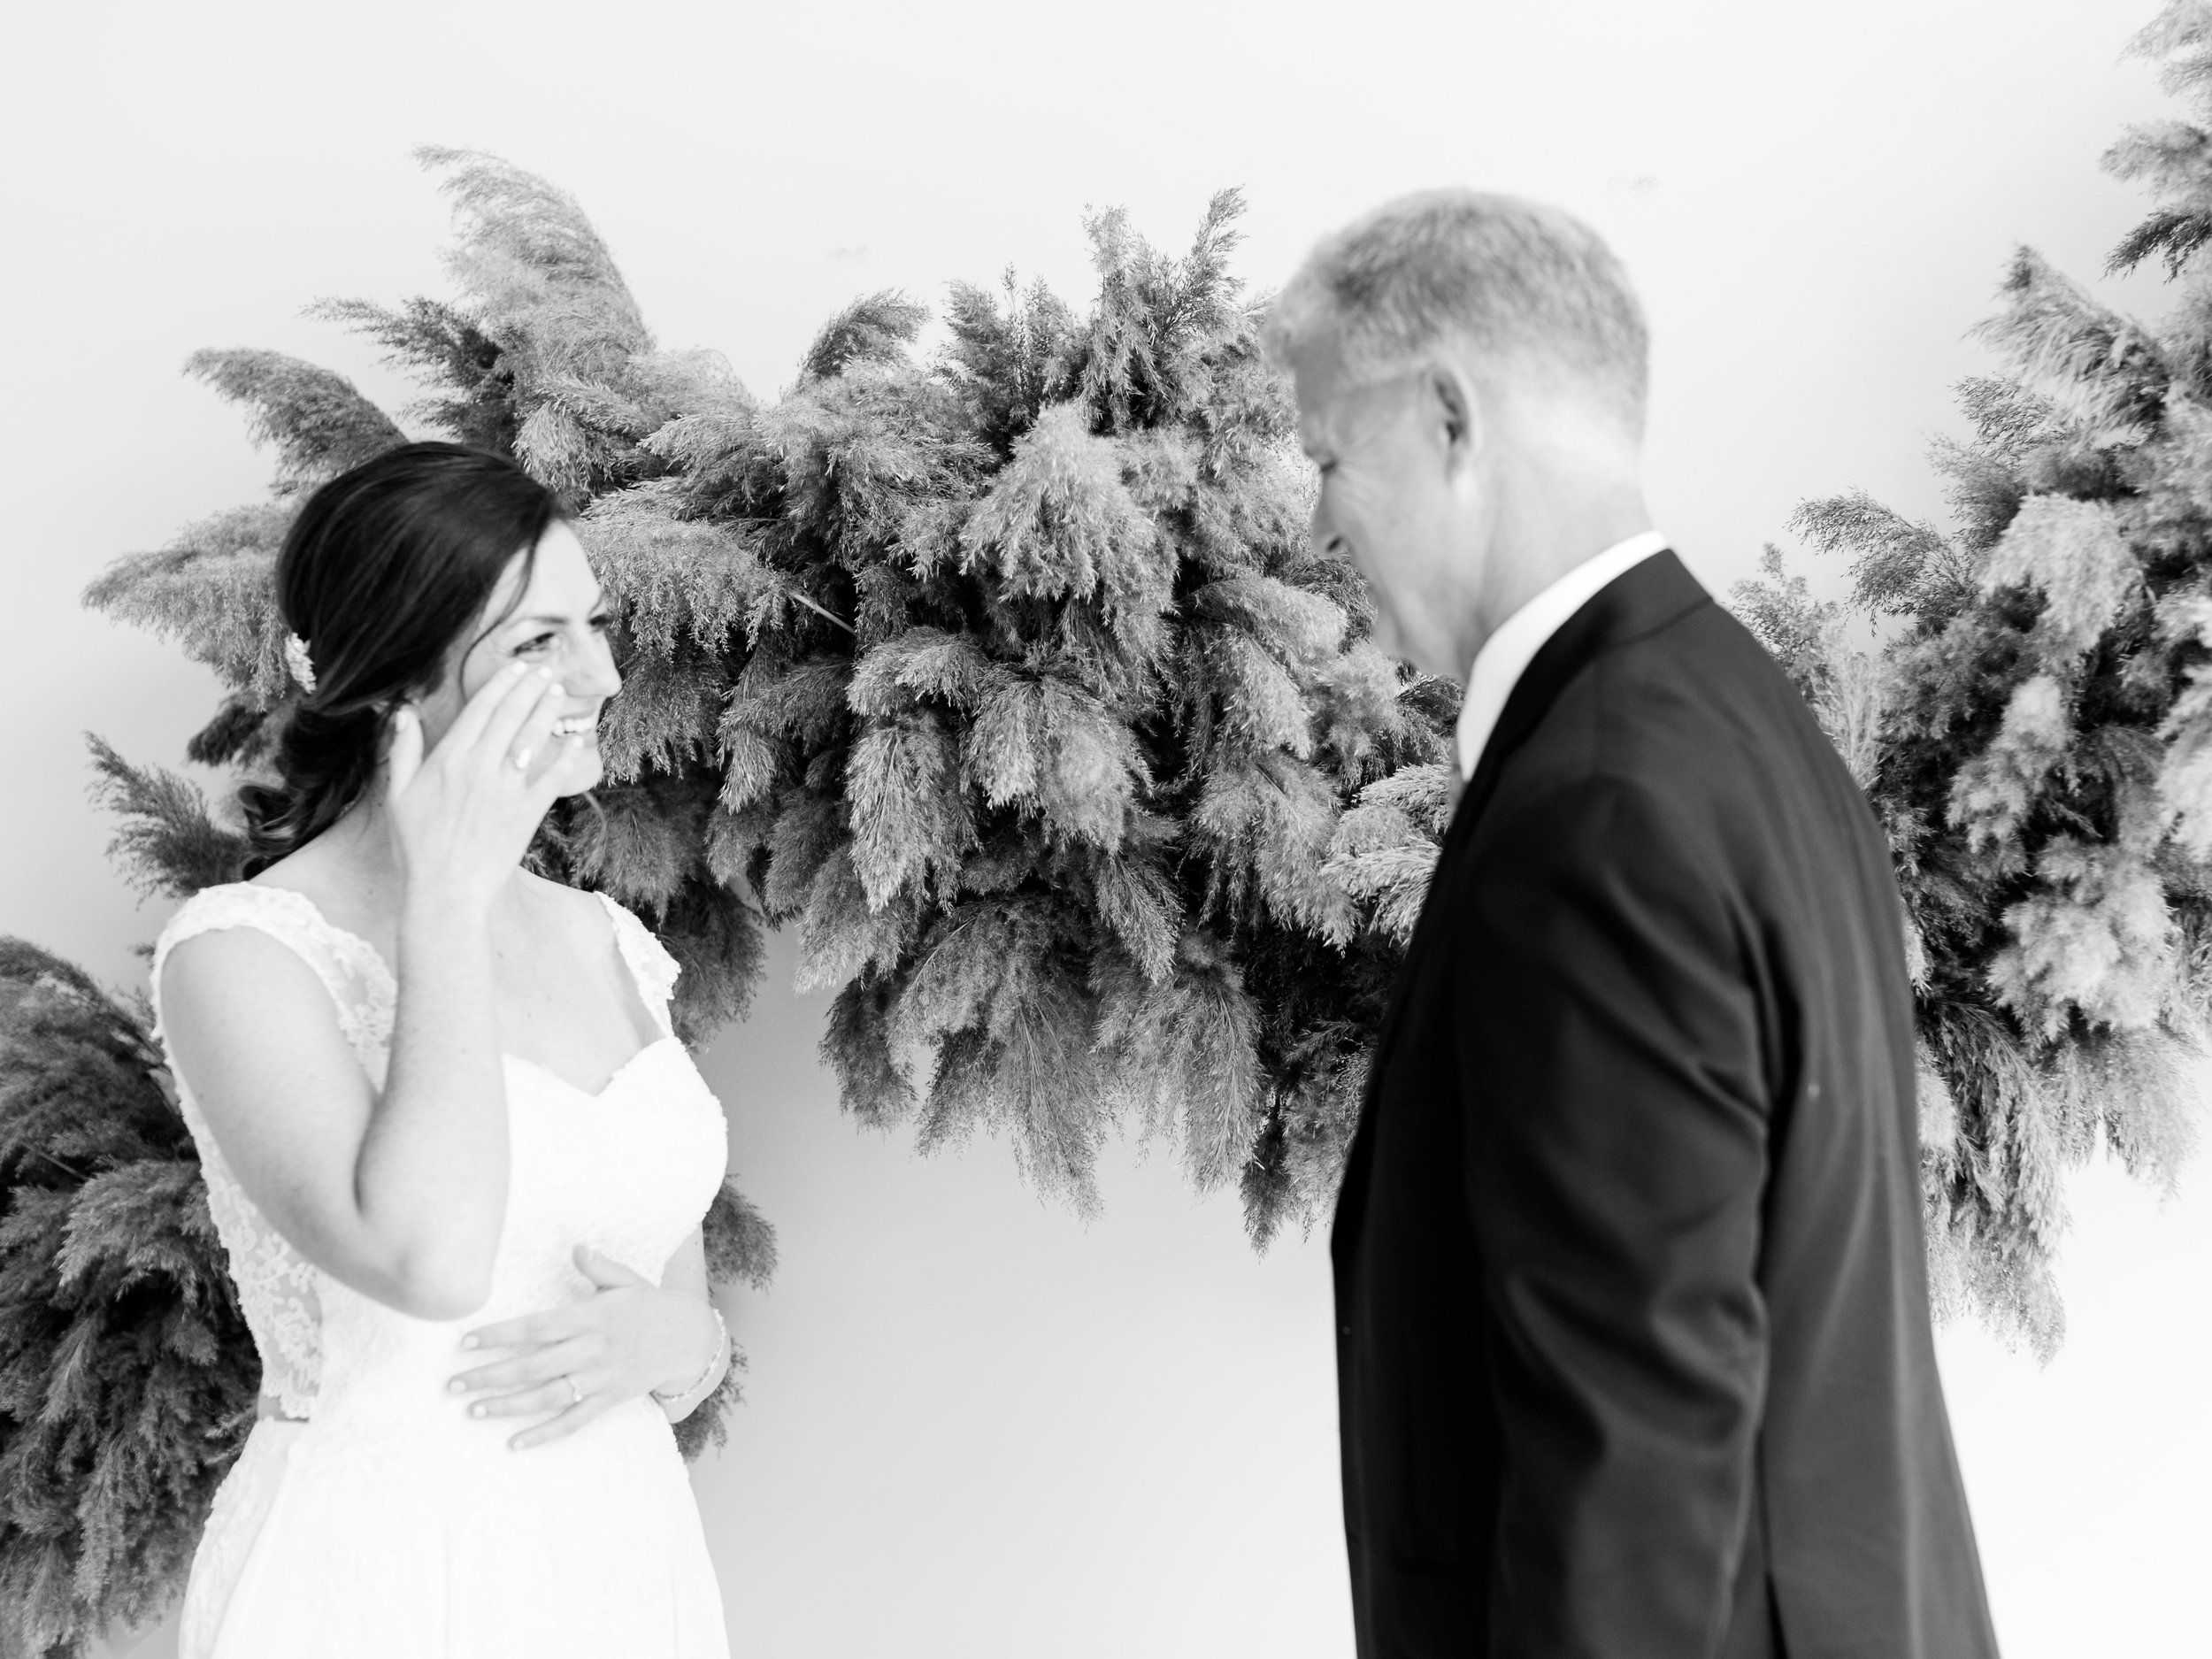 Julius+Wedding+FirstLook+Dad-8.jpg